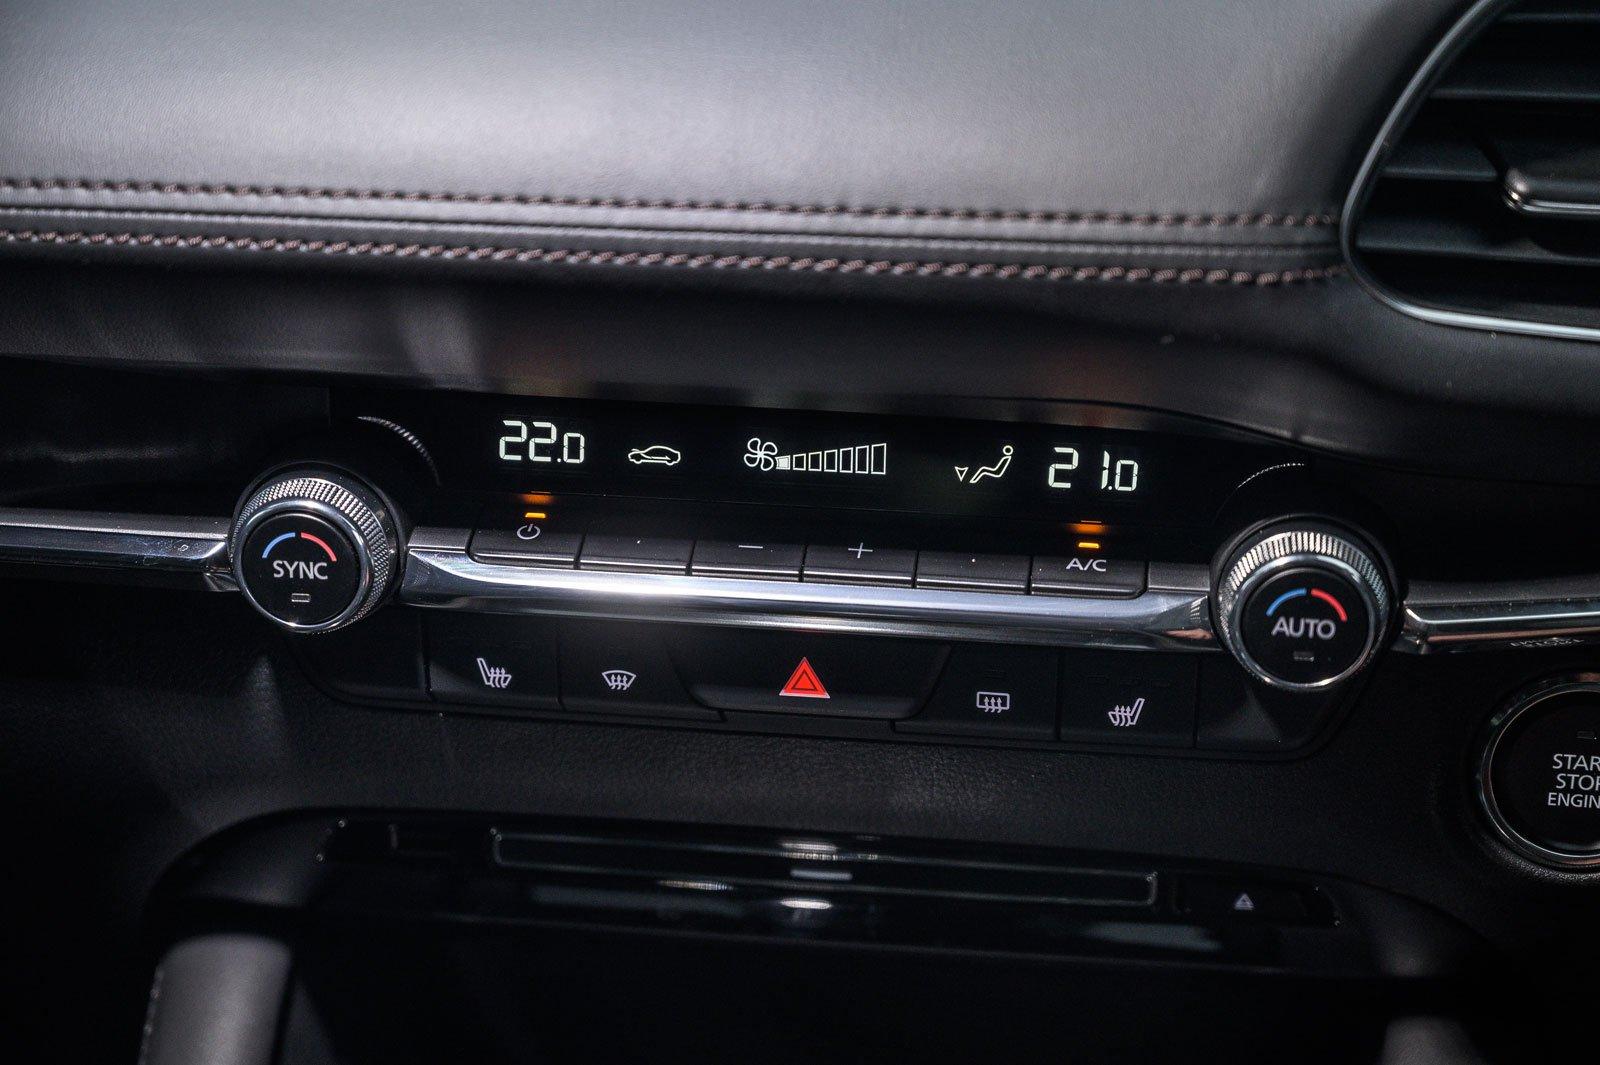 Mazda 3 air-con controls